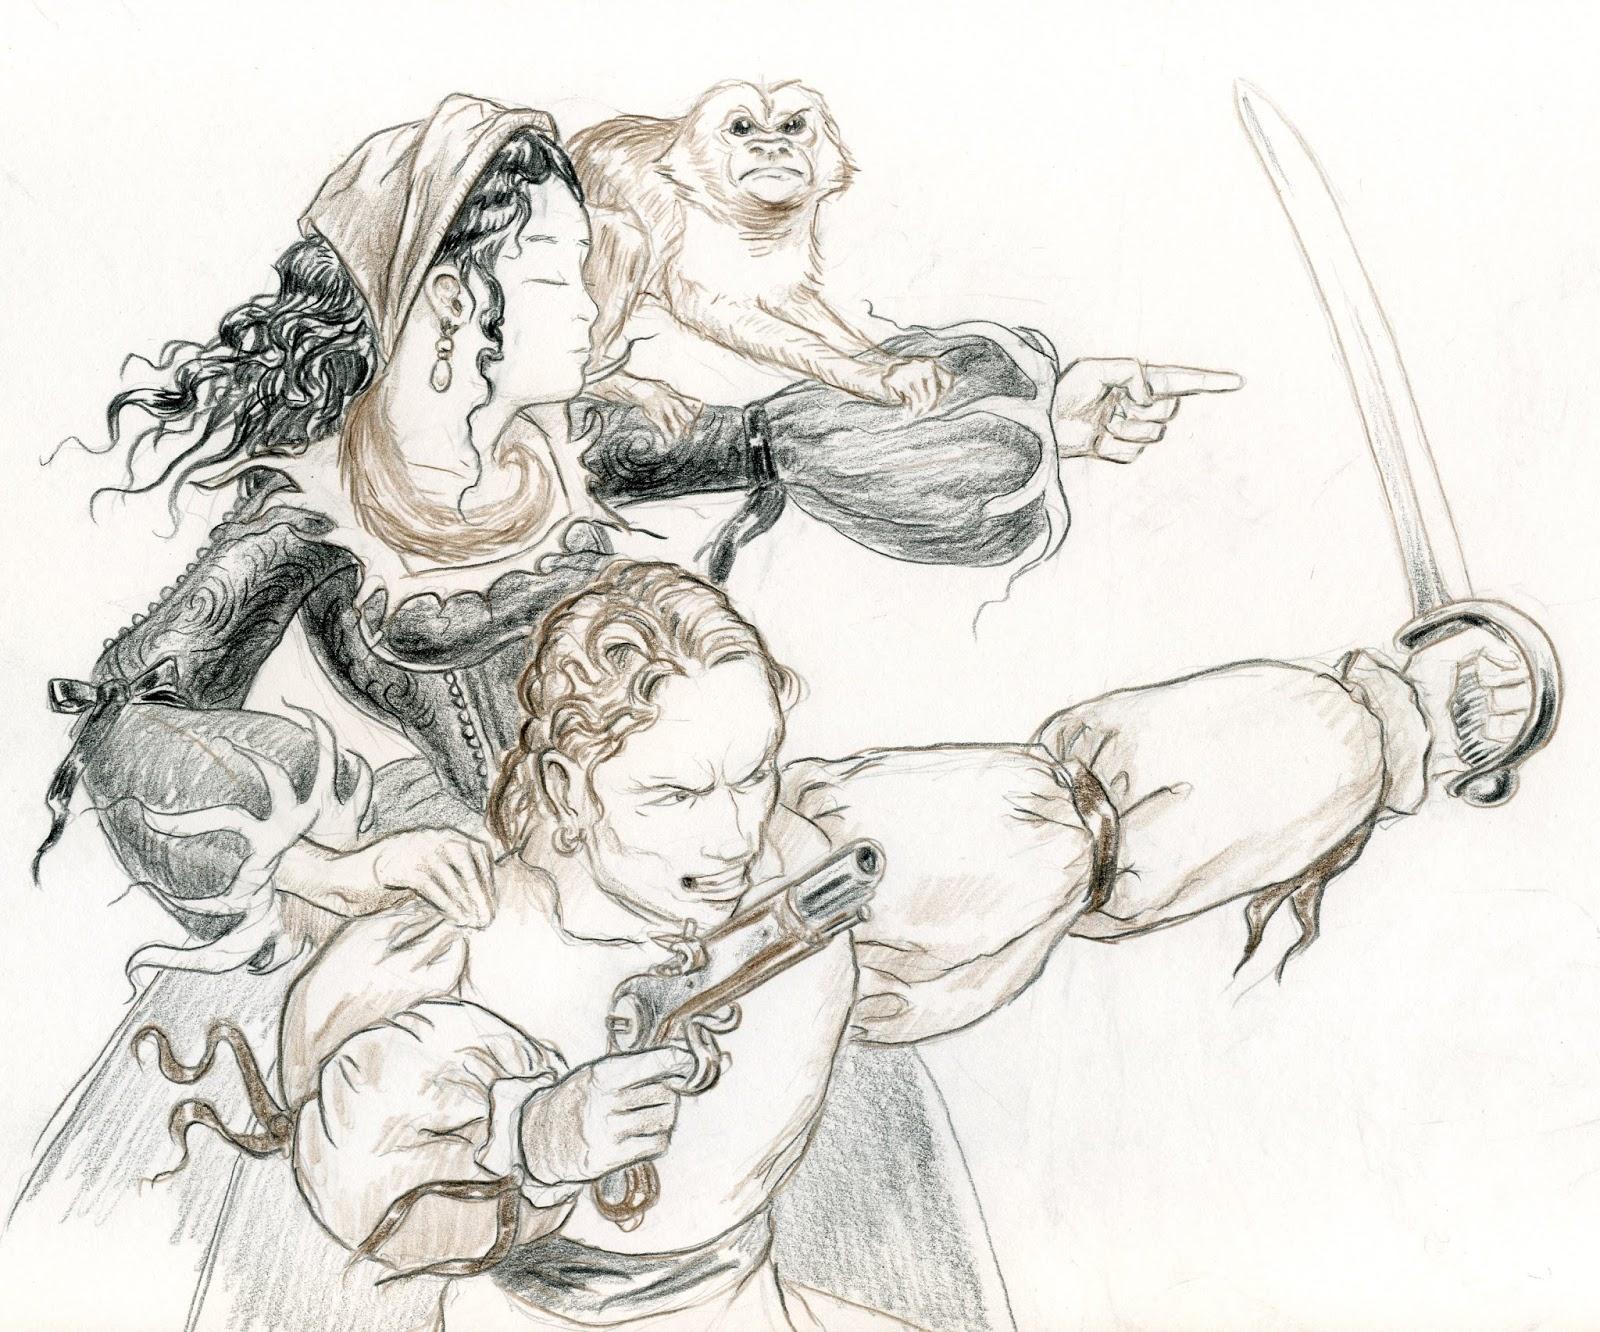 Drawn orc Pencil [Drawing] Blue Boxer 2013